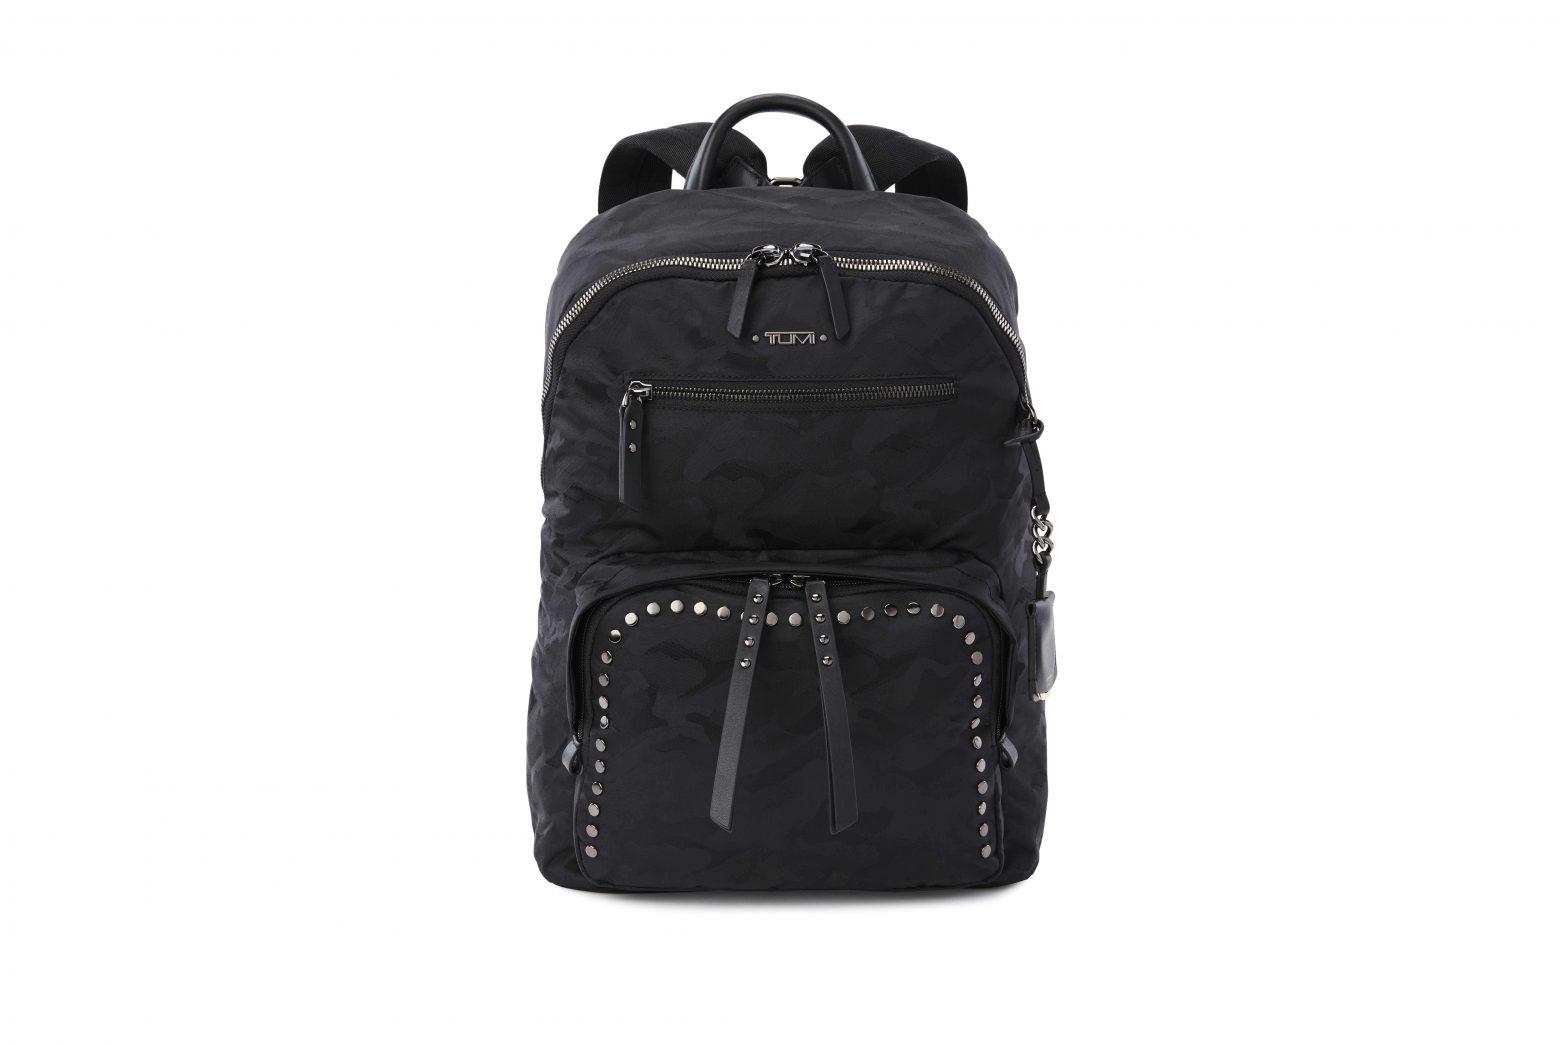 TUMI Voyageur Novelty Hagen Backpack - Black Camo